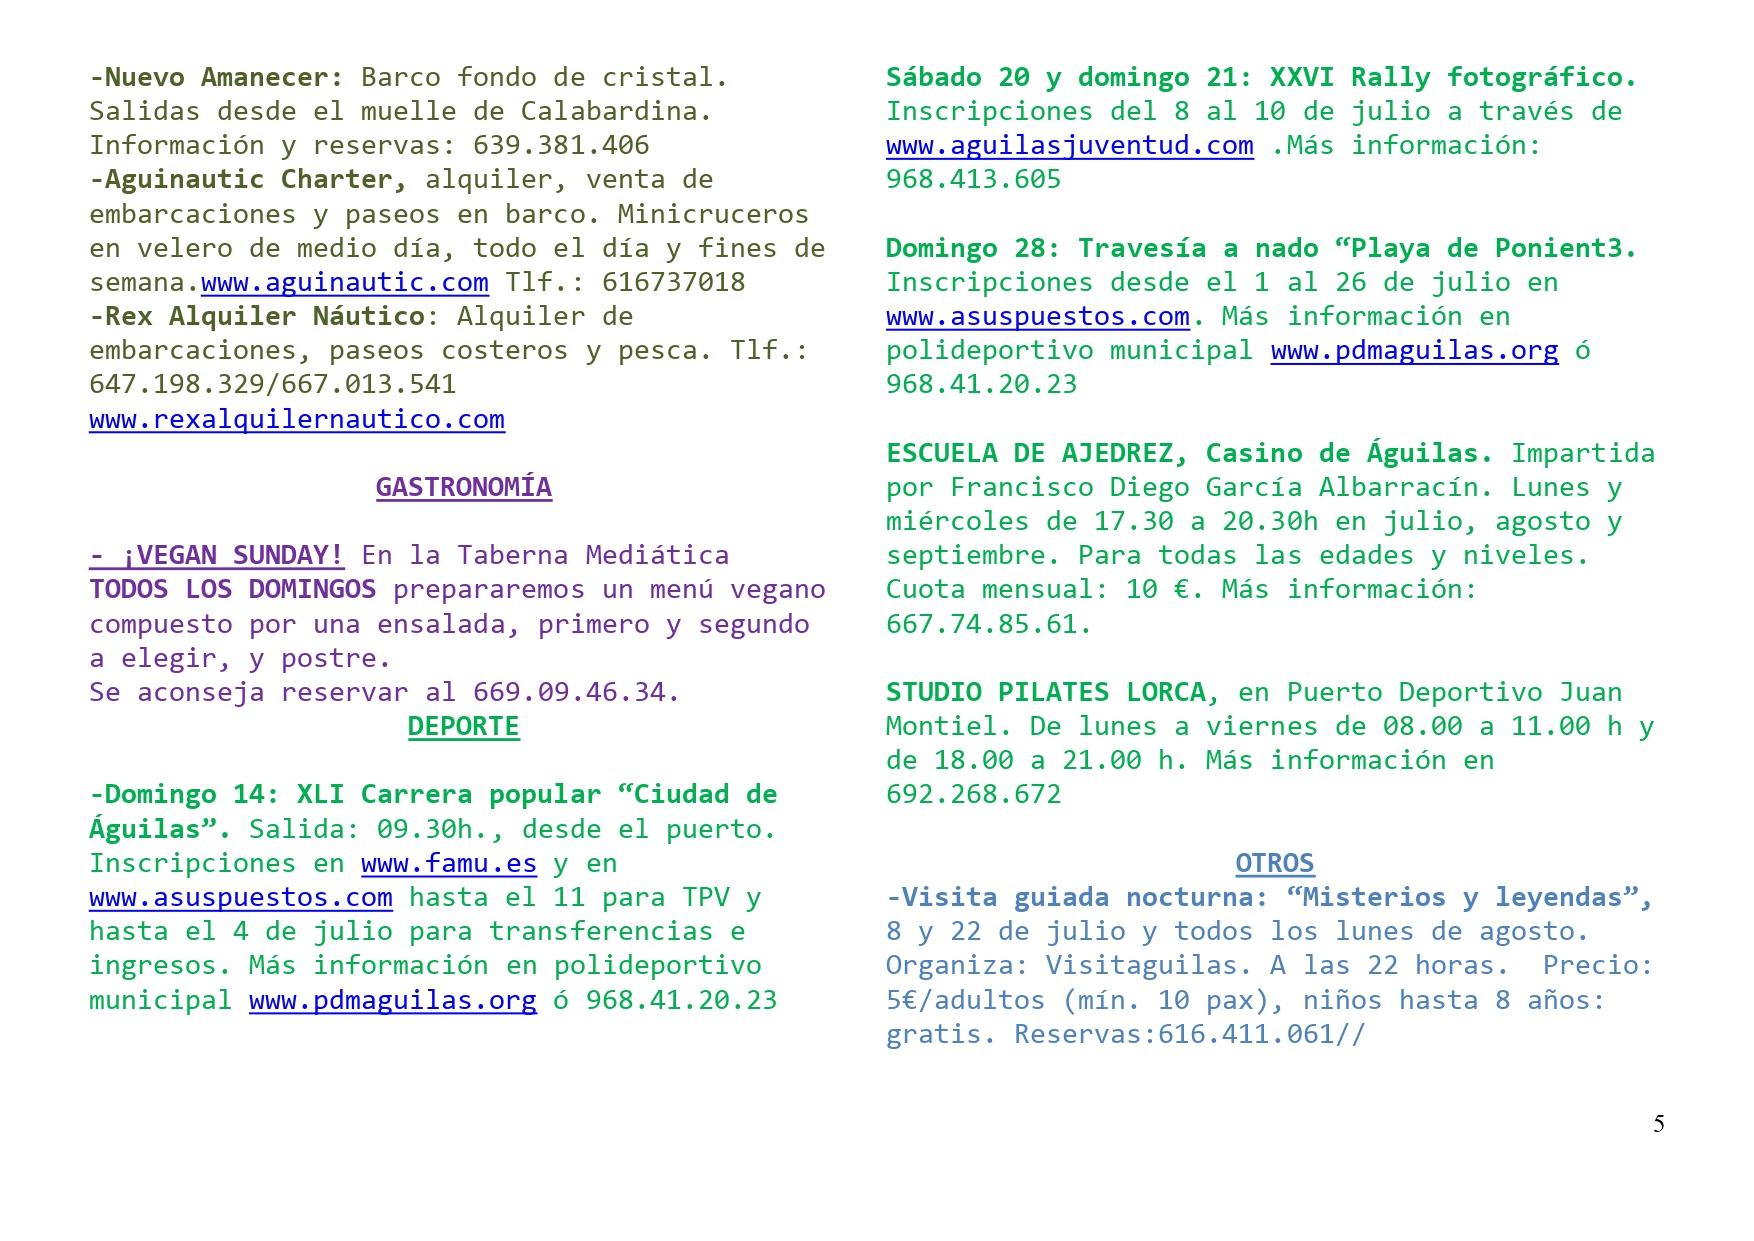 66b255_page-0005.jpg